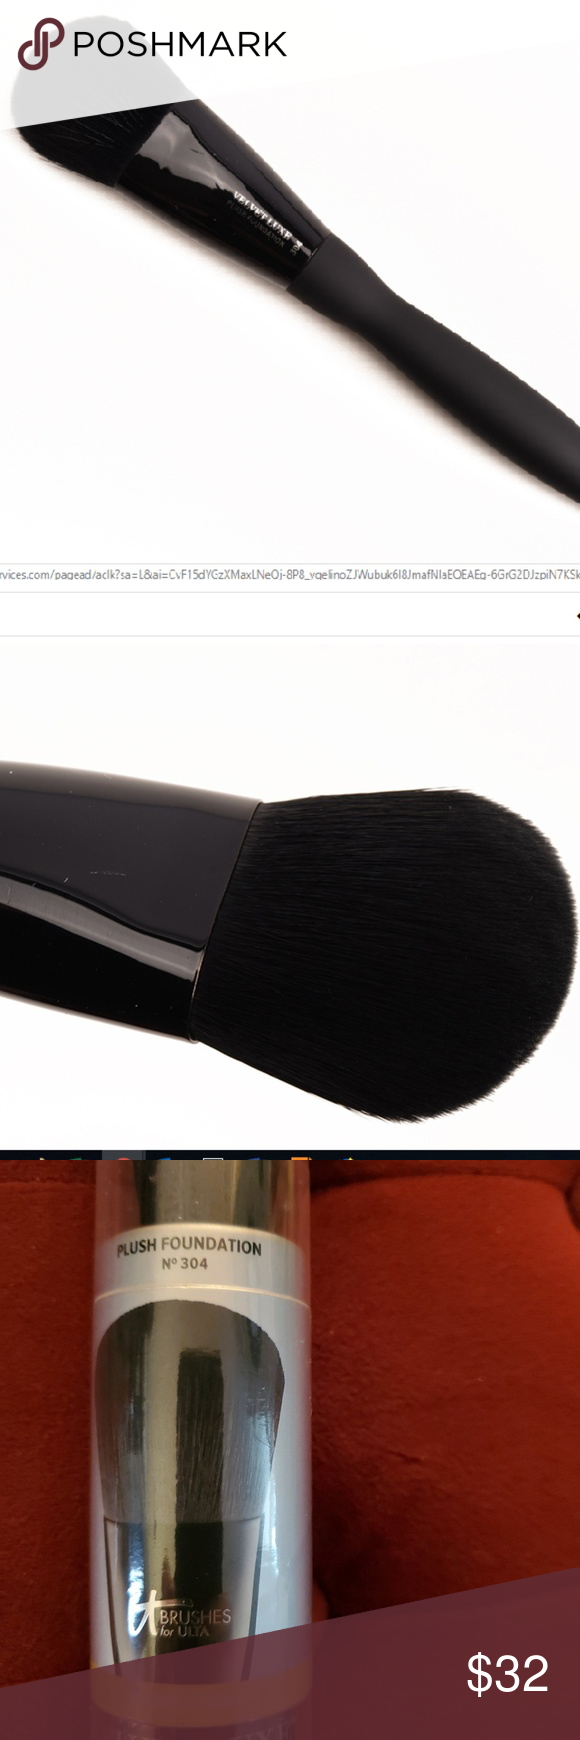 IT No. 304 Velvet Luxe Plush Foundation Brush Foundation